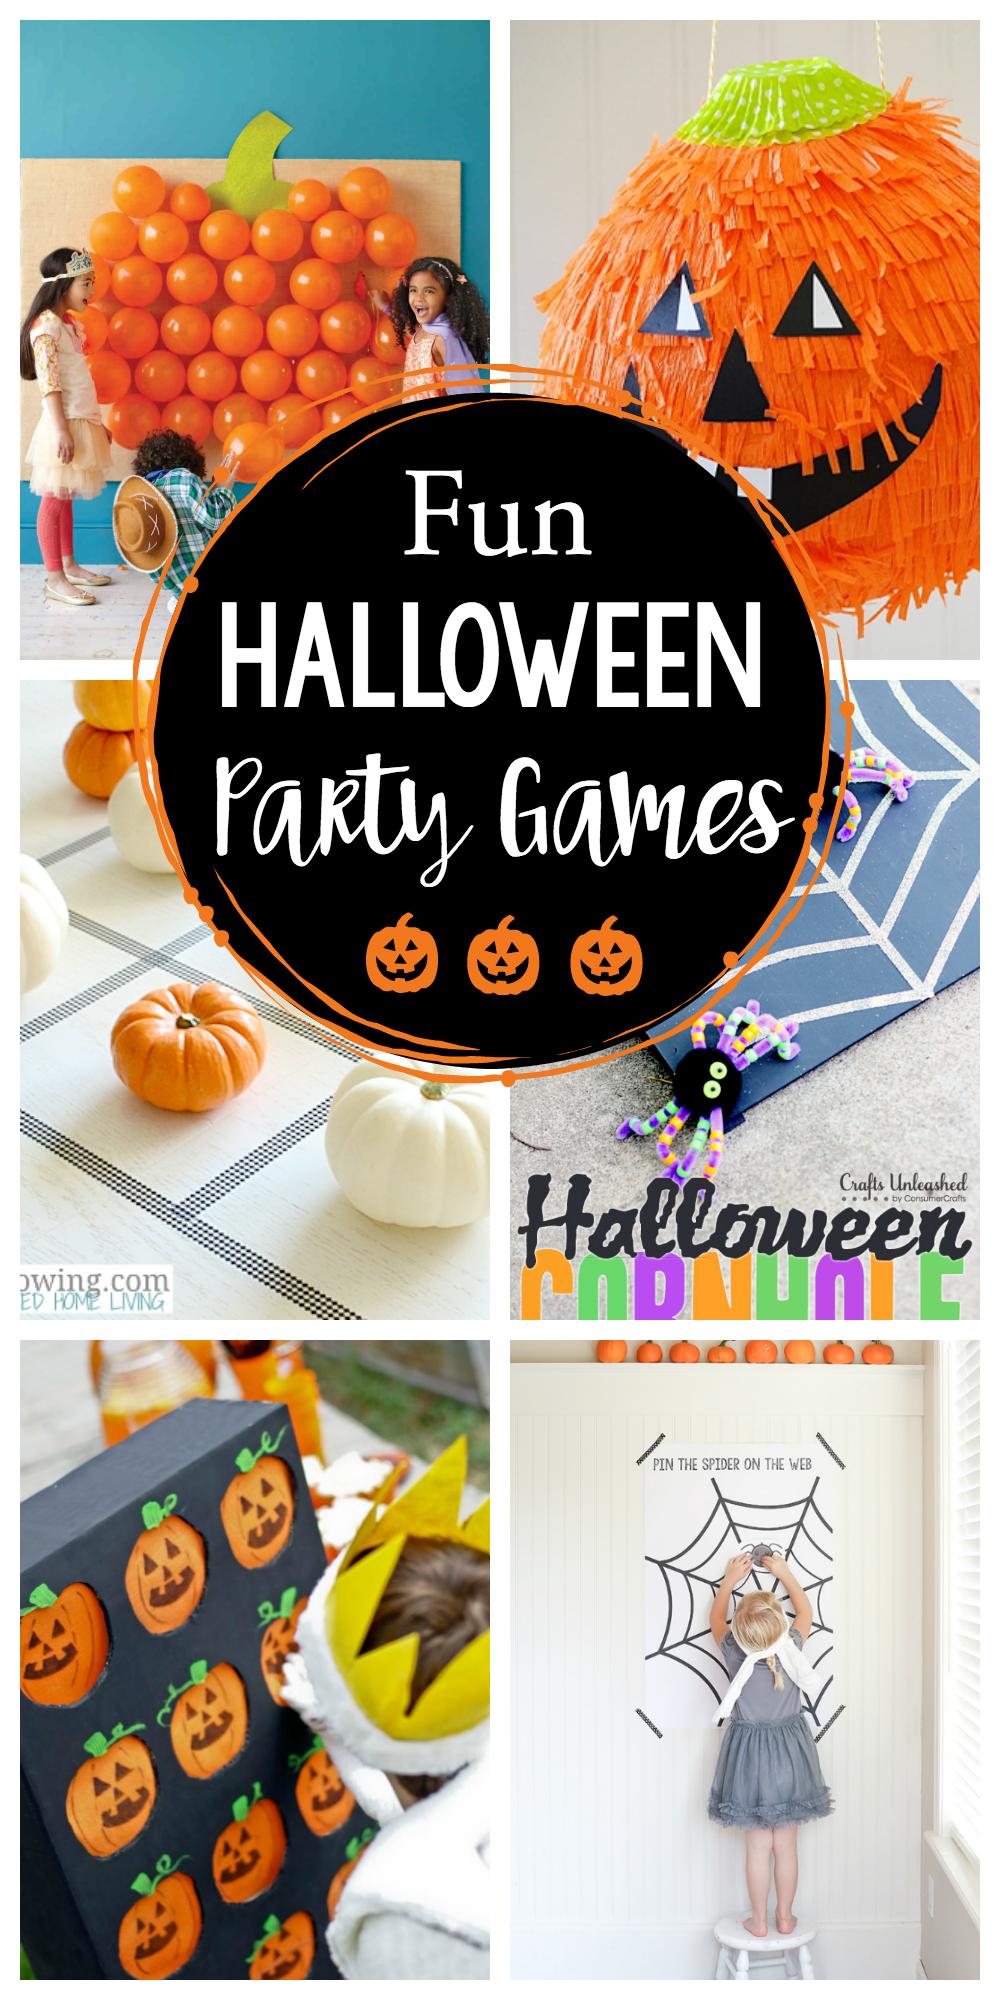 25 Fun Halloween Party Games